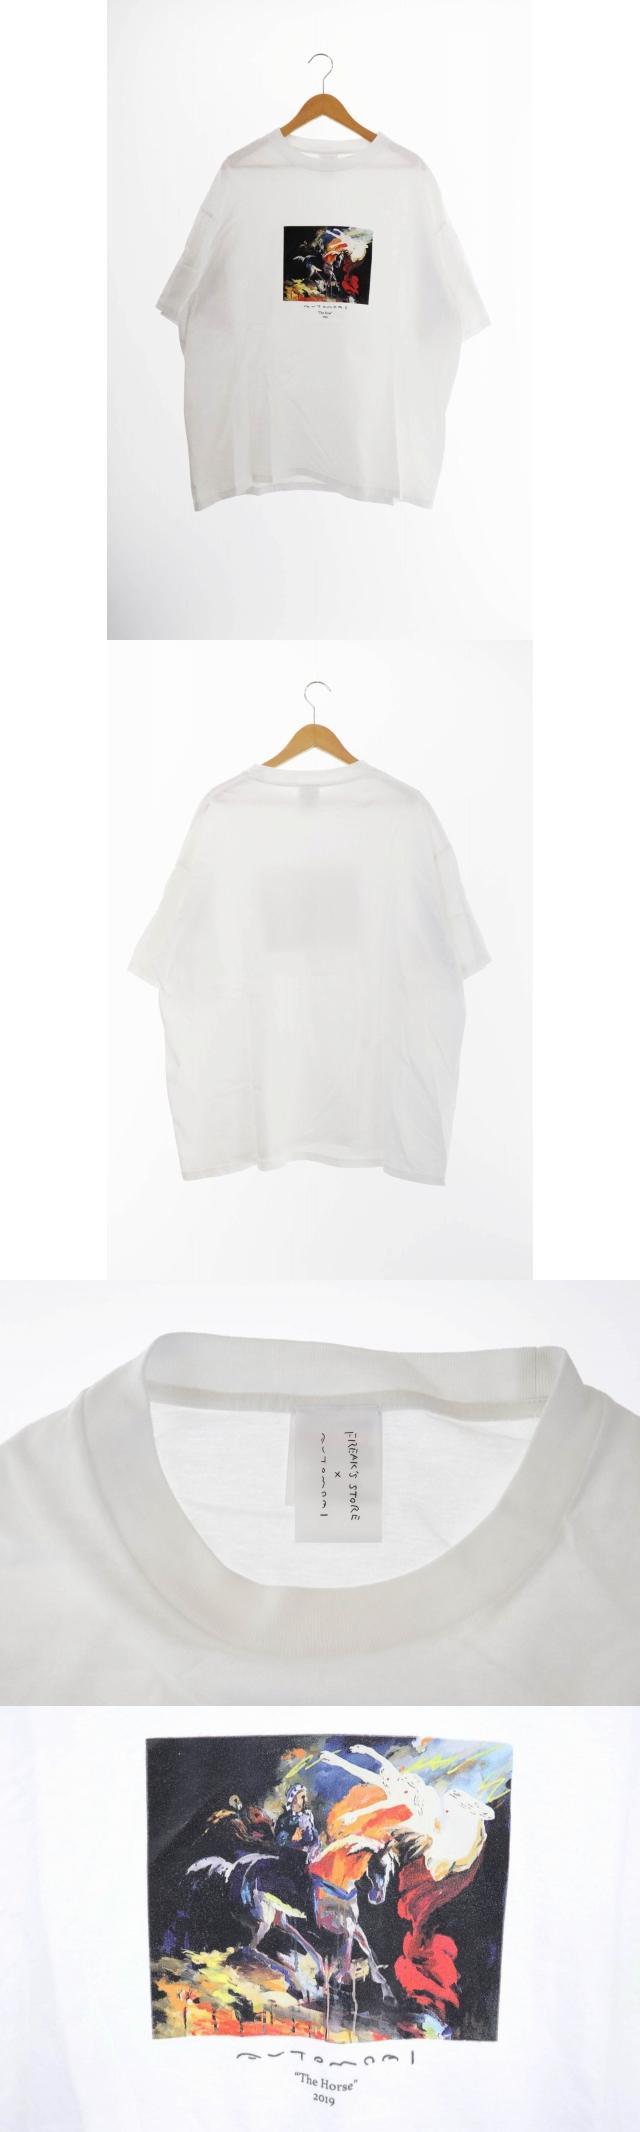 ×AUTOMOAI オートモアイ 19SS THE HOUSE プリント 半袖 Tシャツ XL 白 ホワイト ブランド古着ベクトル 中古 200318 0009